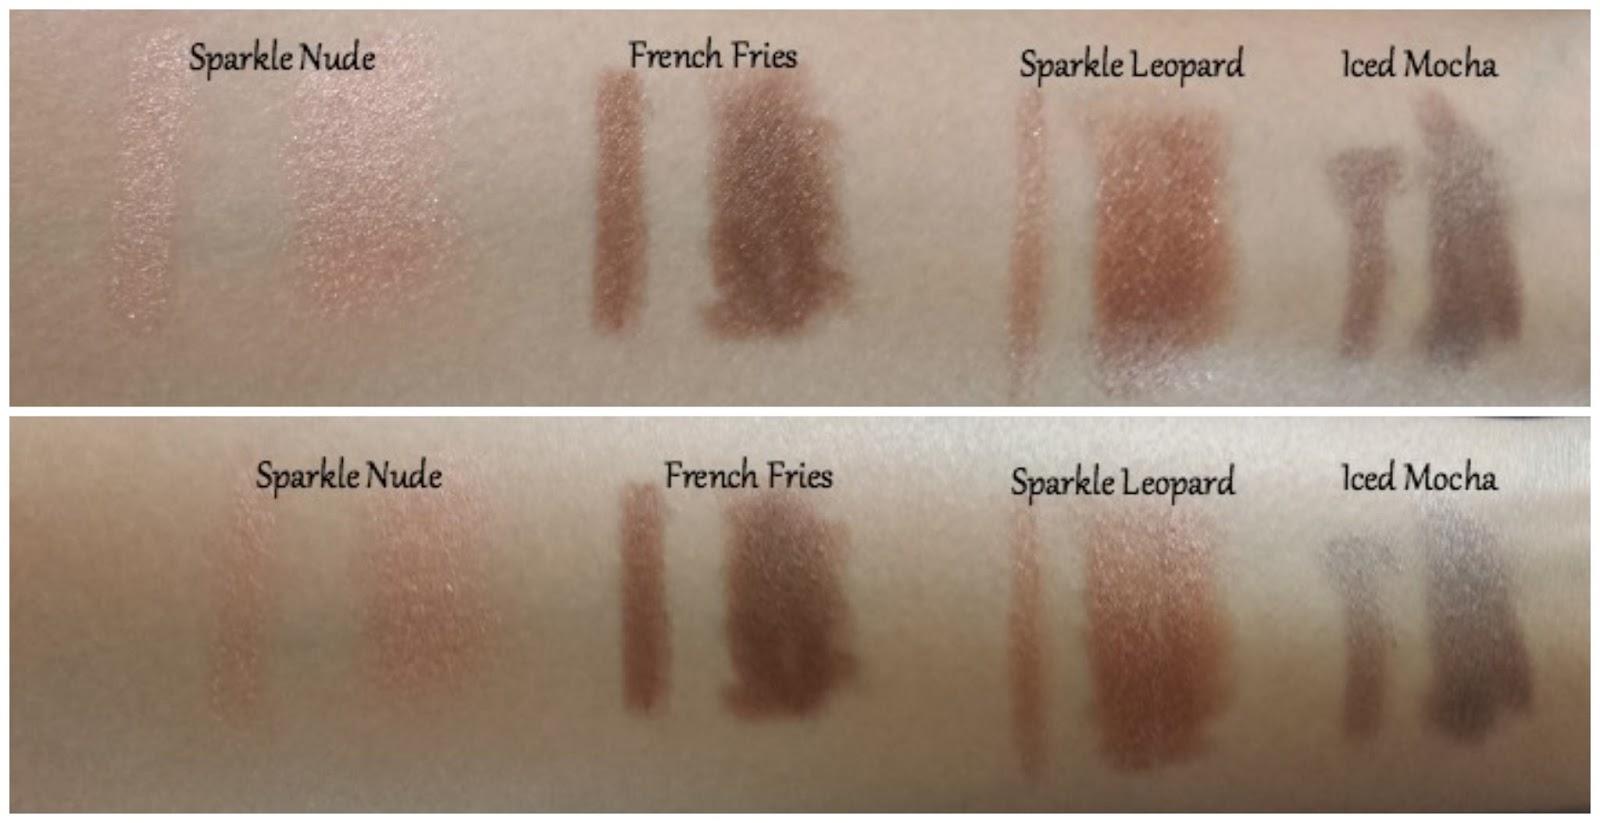 product smackdown nyx jumbo eye pencil vs nyx glam shadow sticks vs nyx infinite shadow sticks makeup with a heart